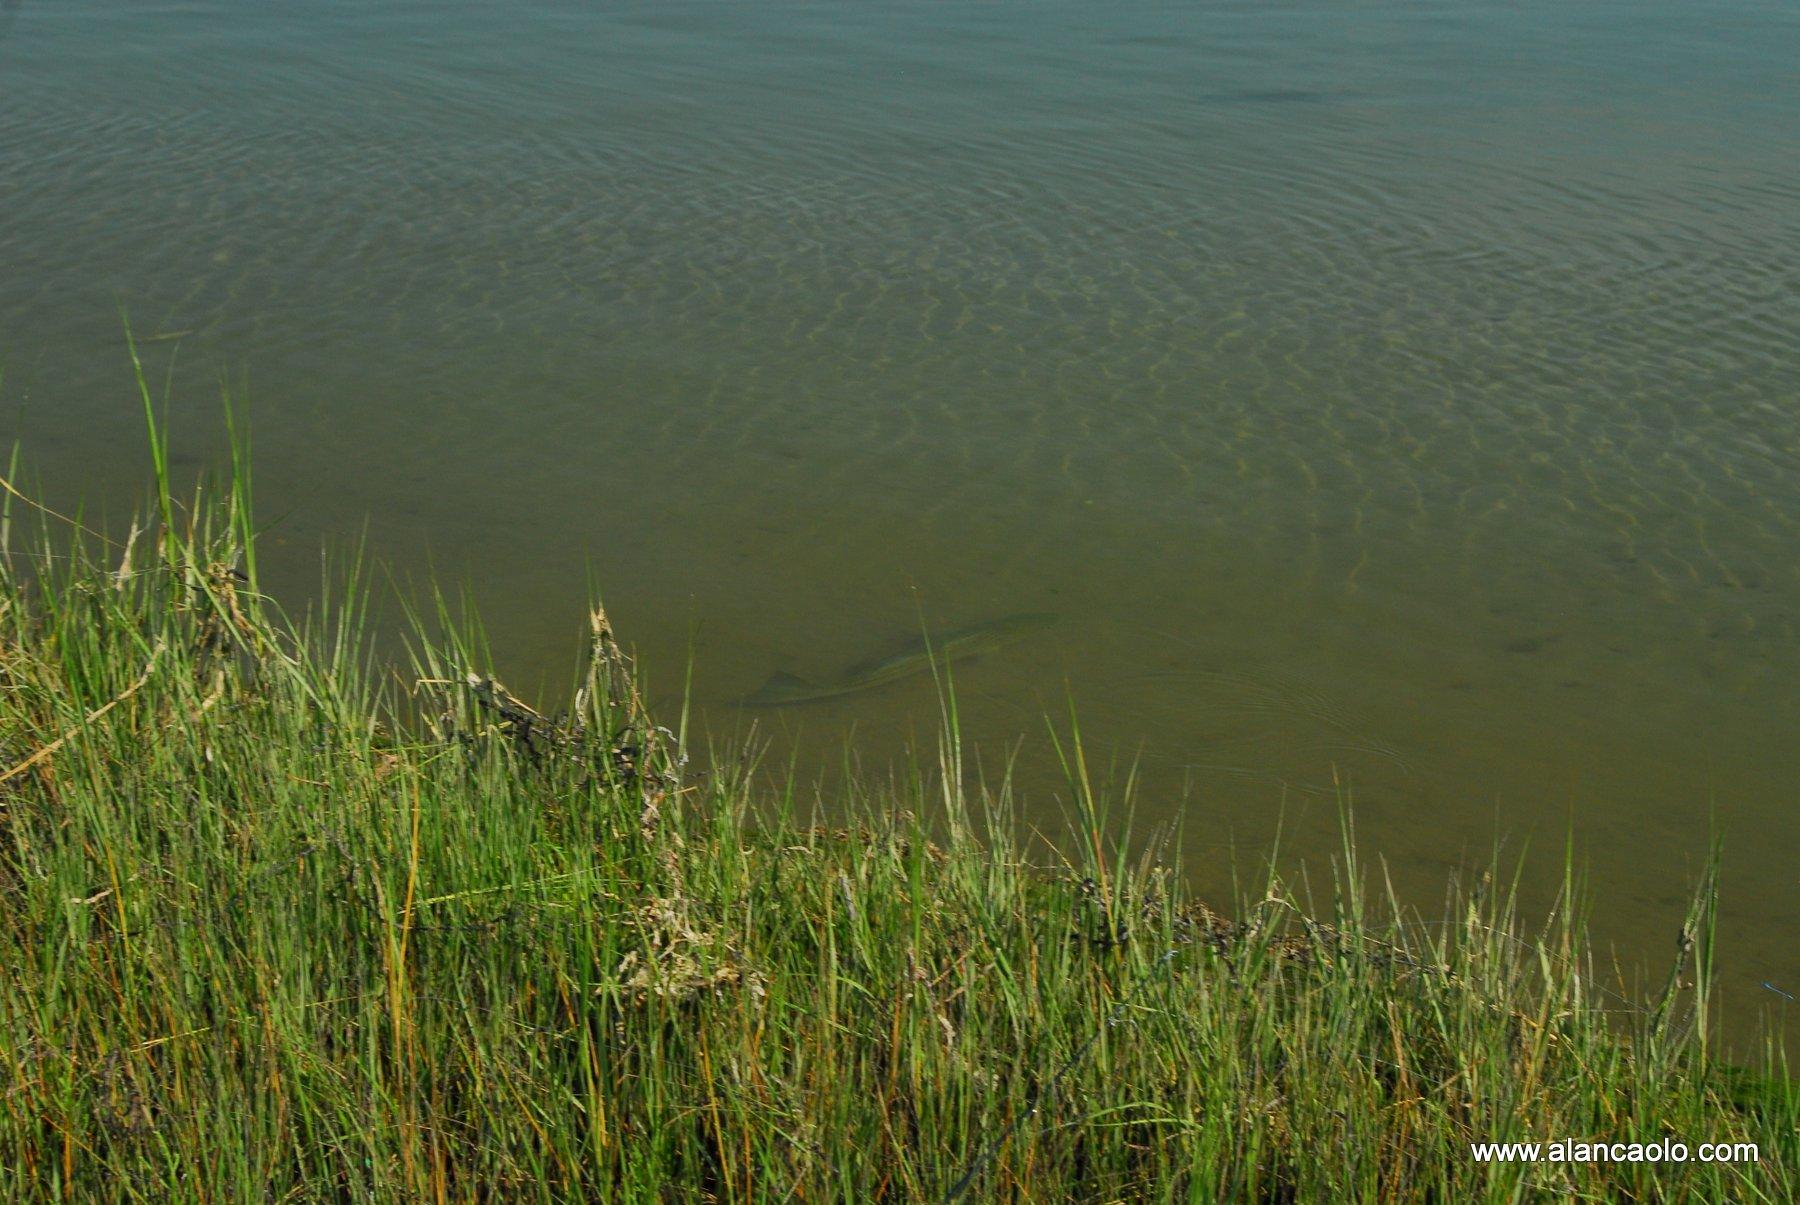 wildlife photography copyright 2020 alan caolo - image